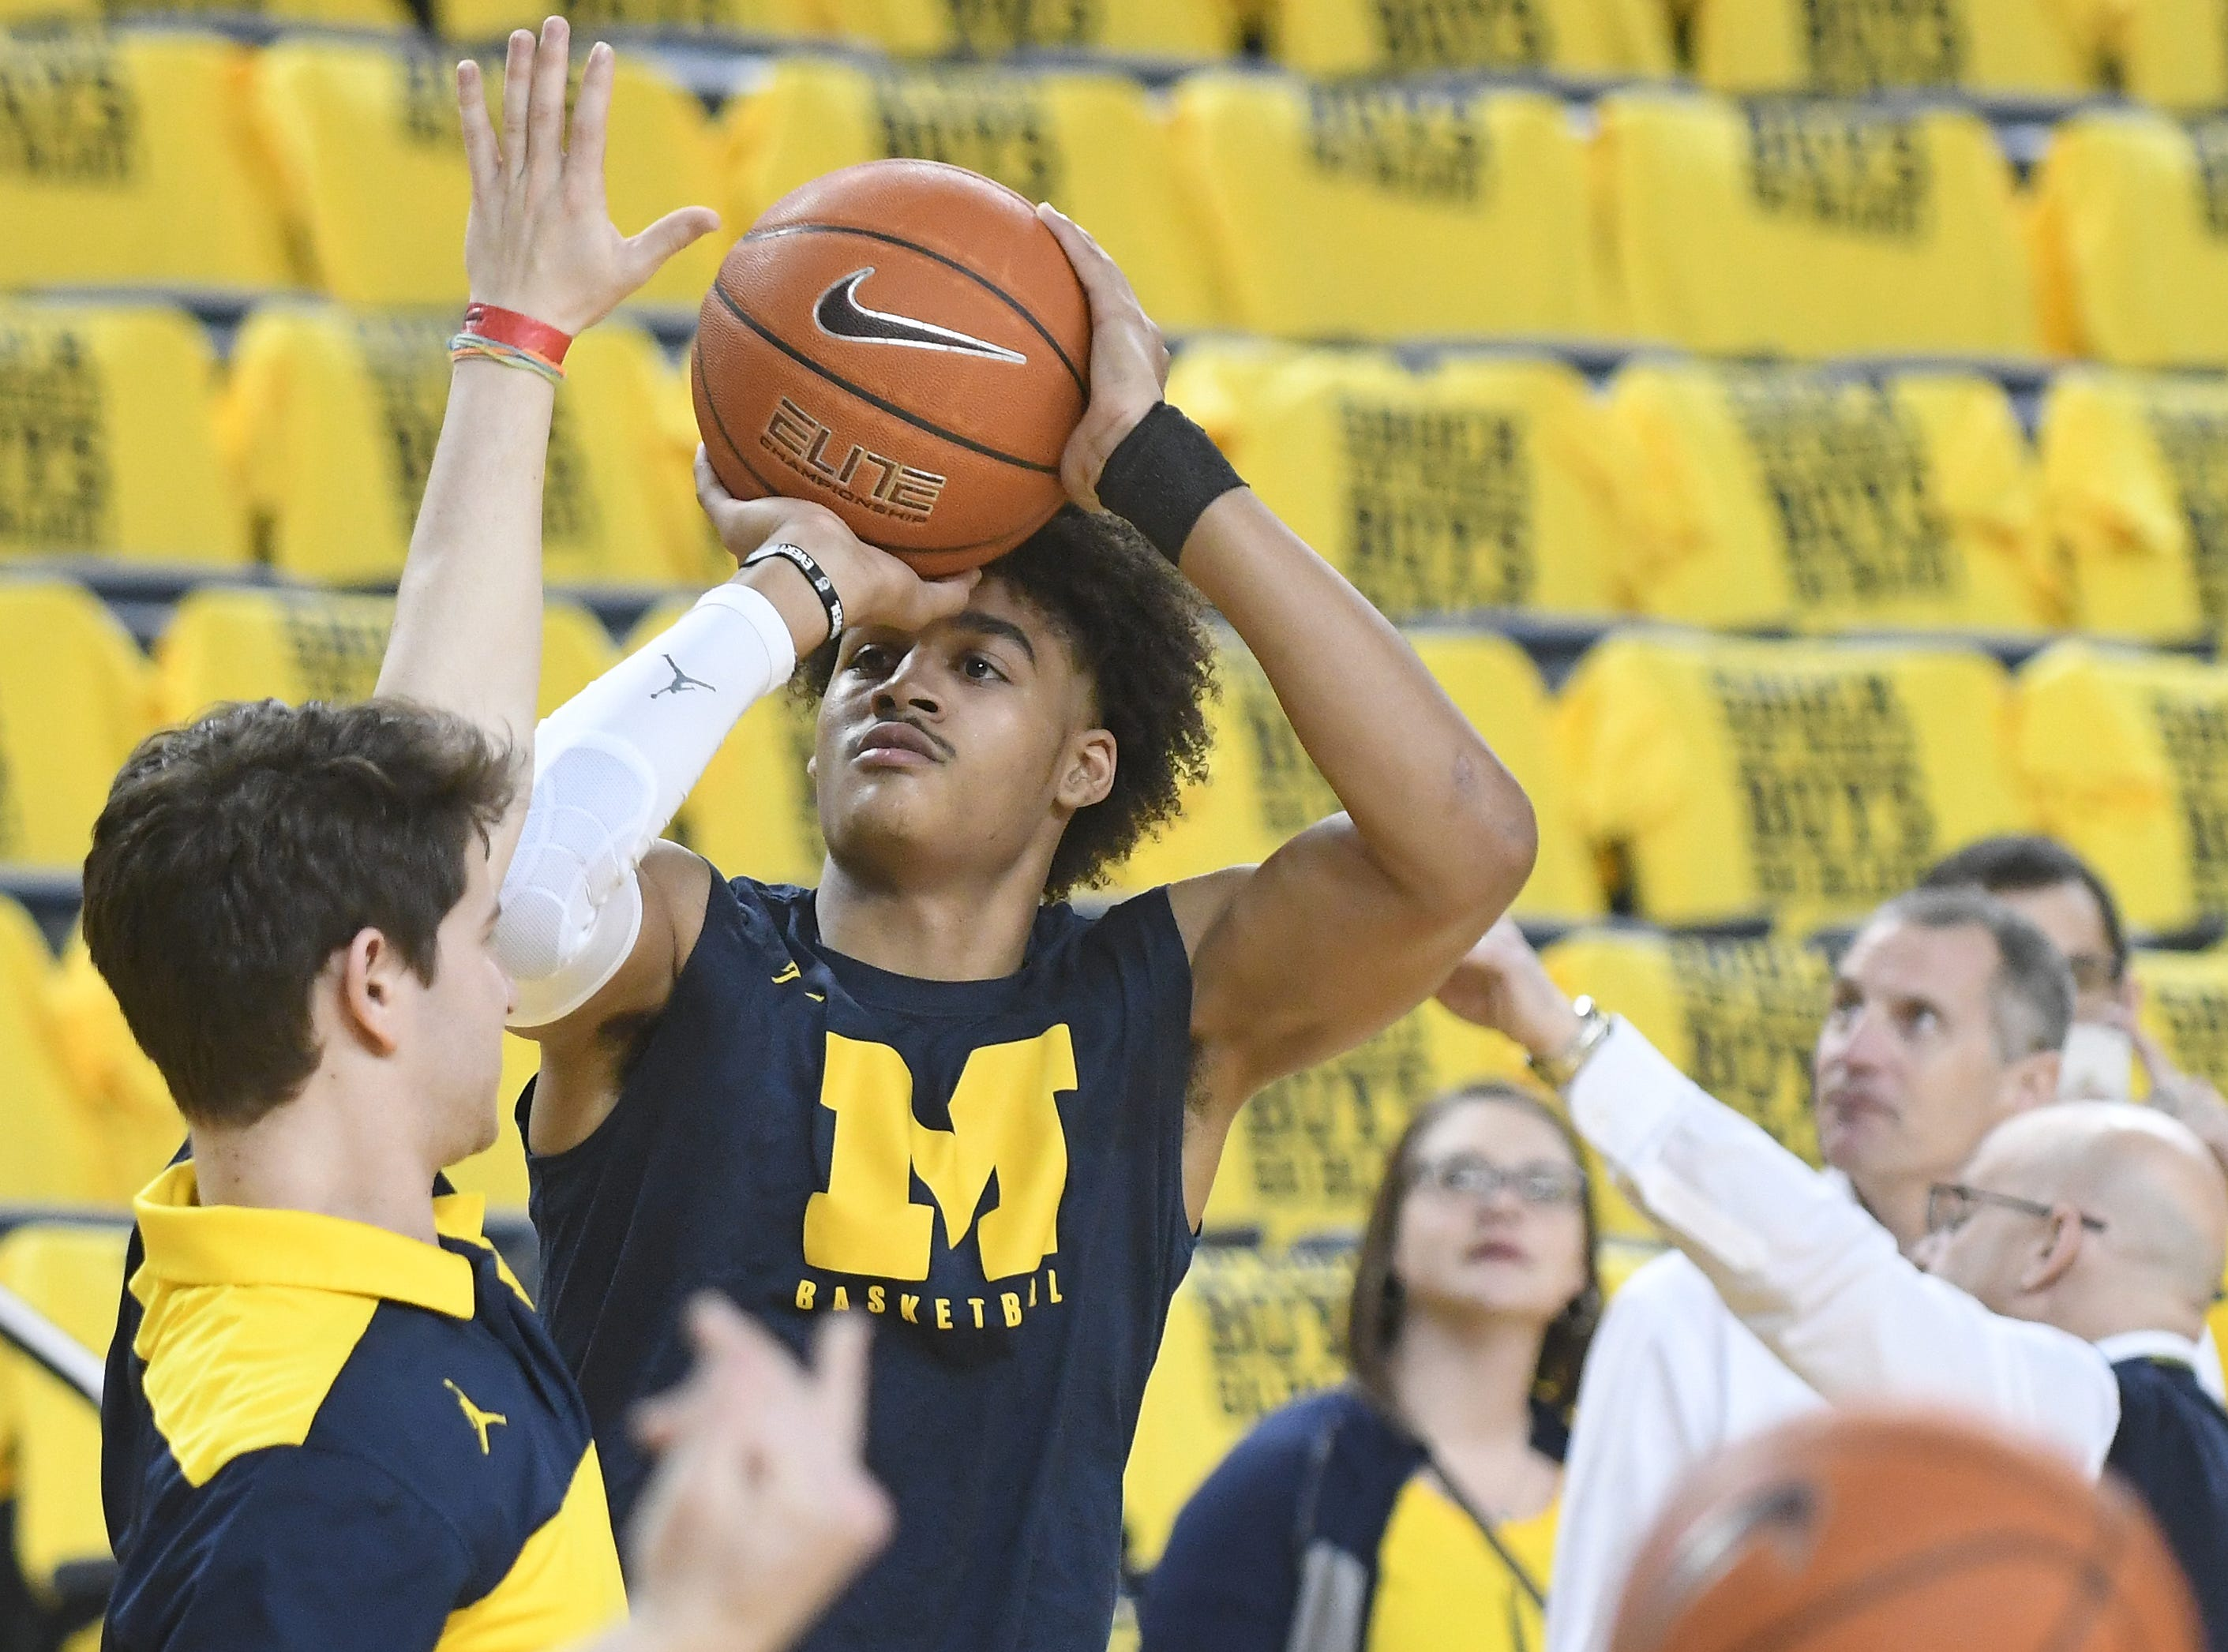 Michigan's Jordan Poole warms up before taking on Michigan State at Crisler Center in Ann Arbor.